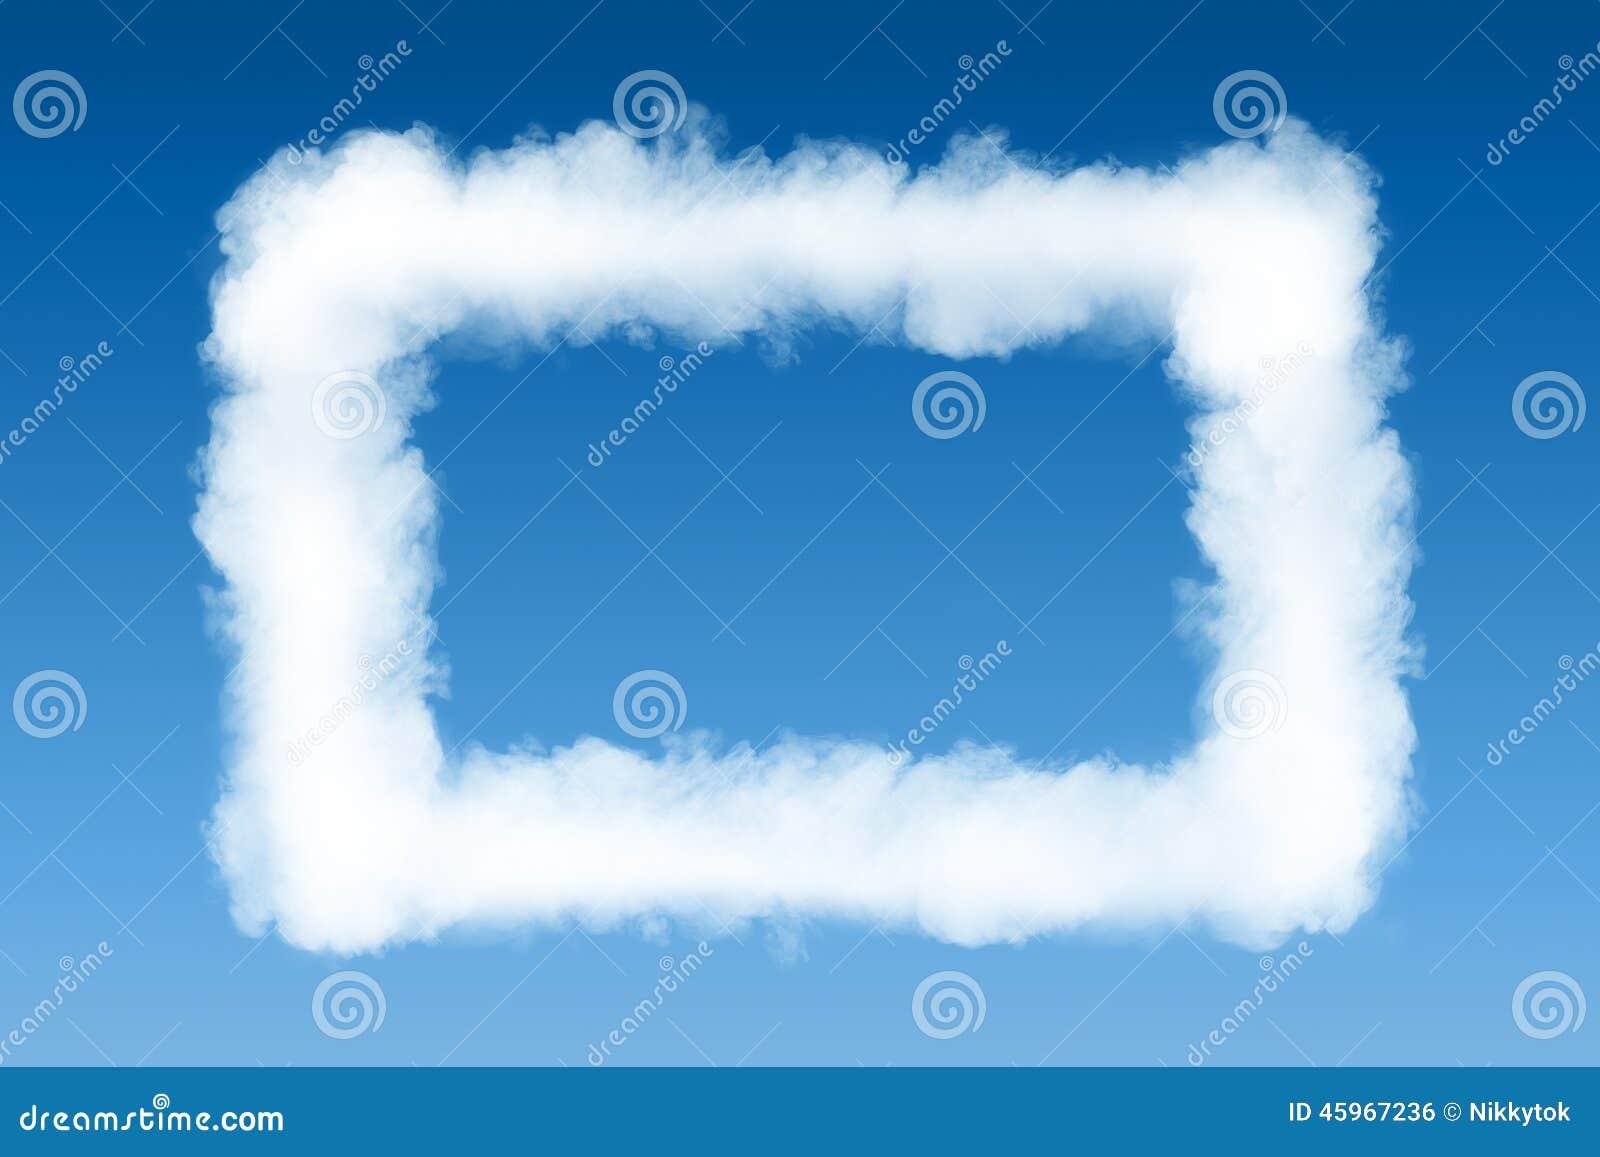 Smoke cloud photo frame stock photo. Image of mask, environment ...